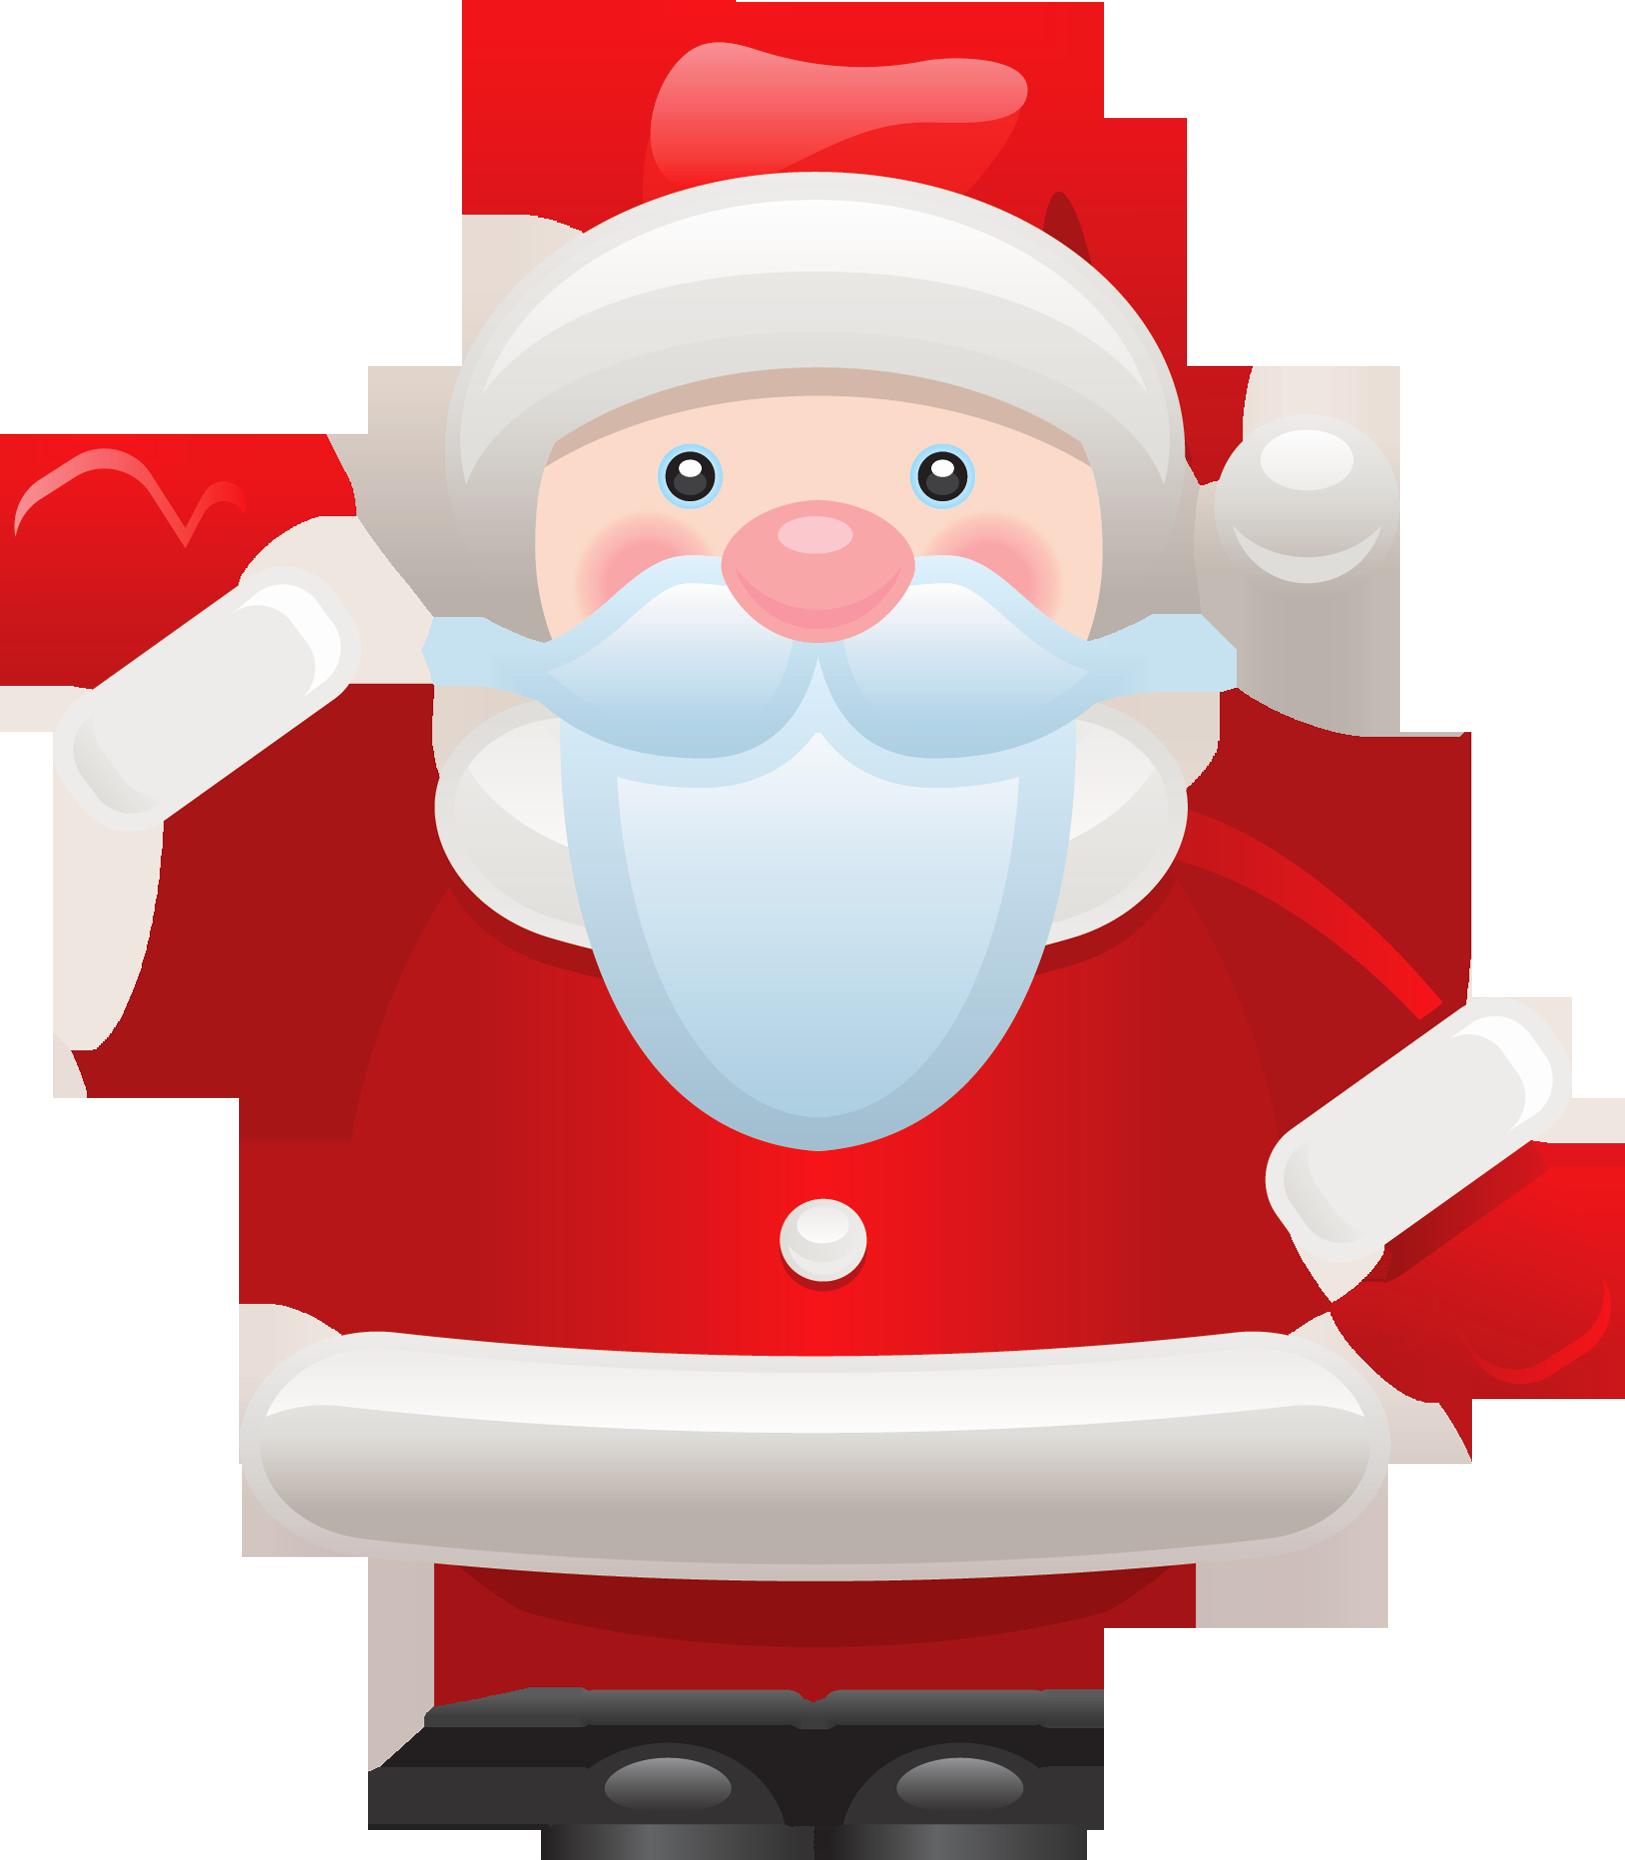 Uncategorized Imagenes Santa Claus santa claus santacols pinterest clip art and gif clipart non solo musica e ricette